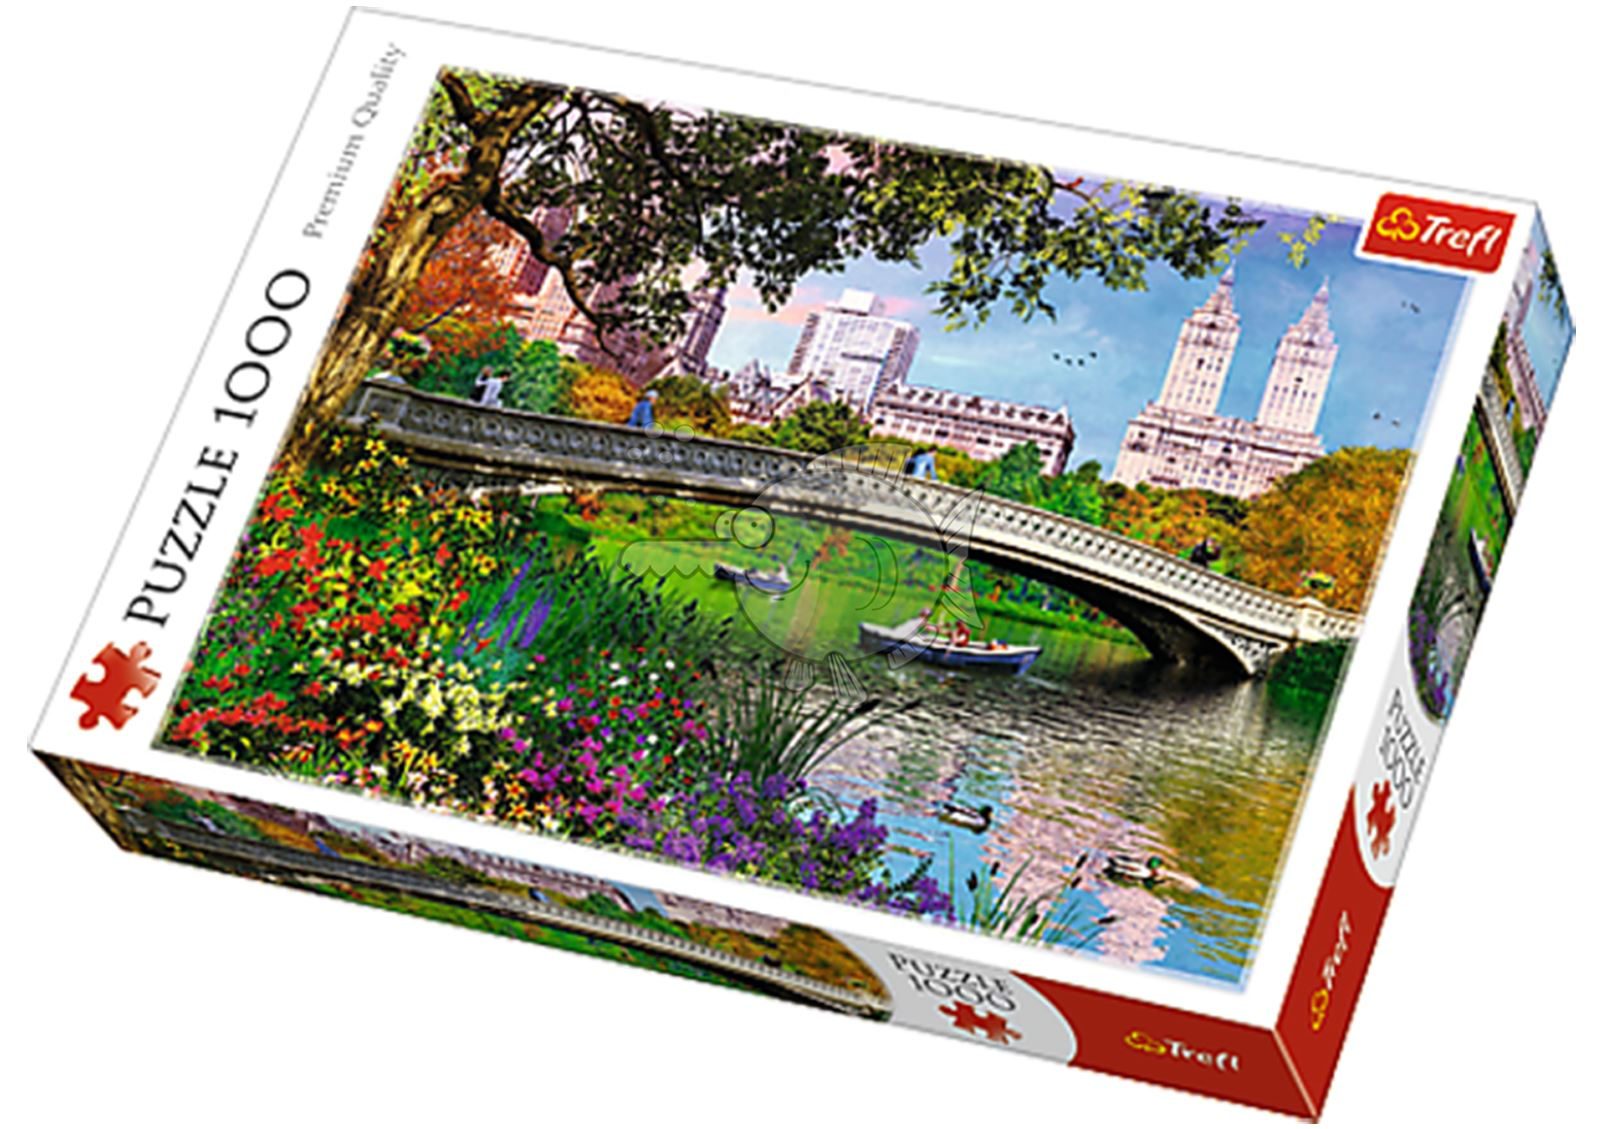 Trefl-300-500-1000-1500-2000-3000-4000-6000-Piece-Jigsaw-Puzzle-Landscapes-City thumbnail 65